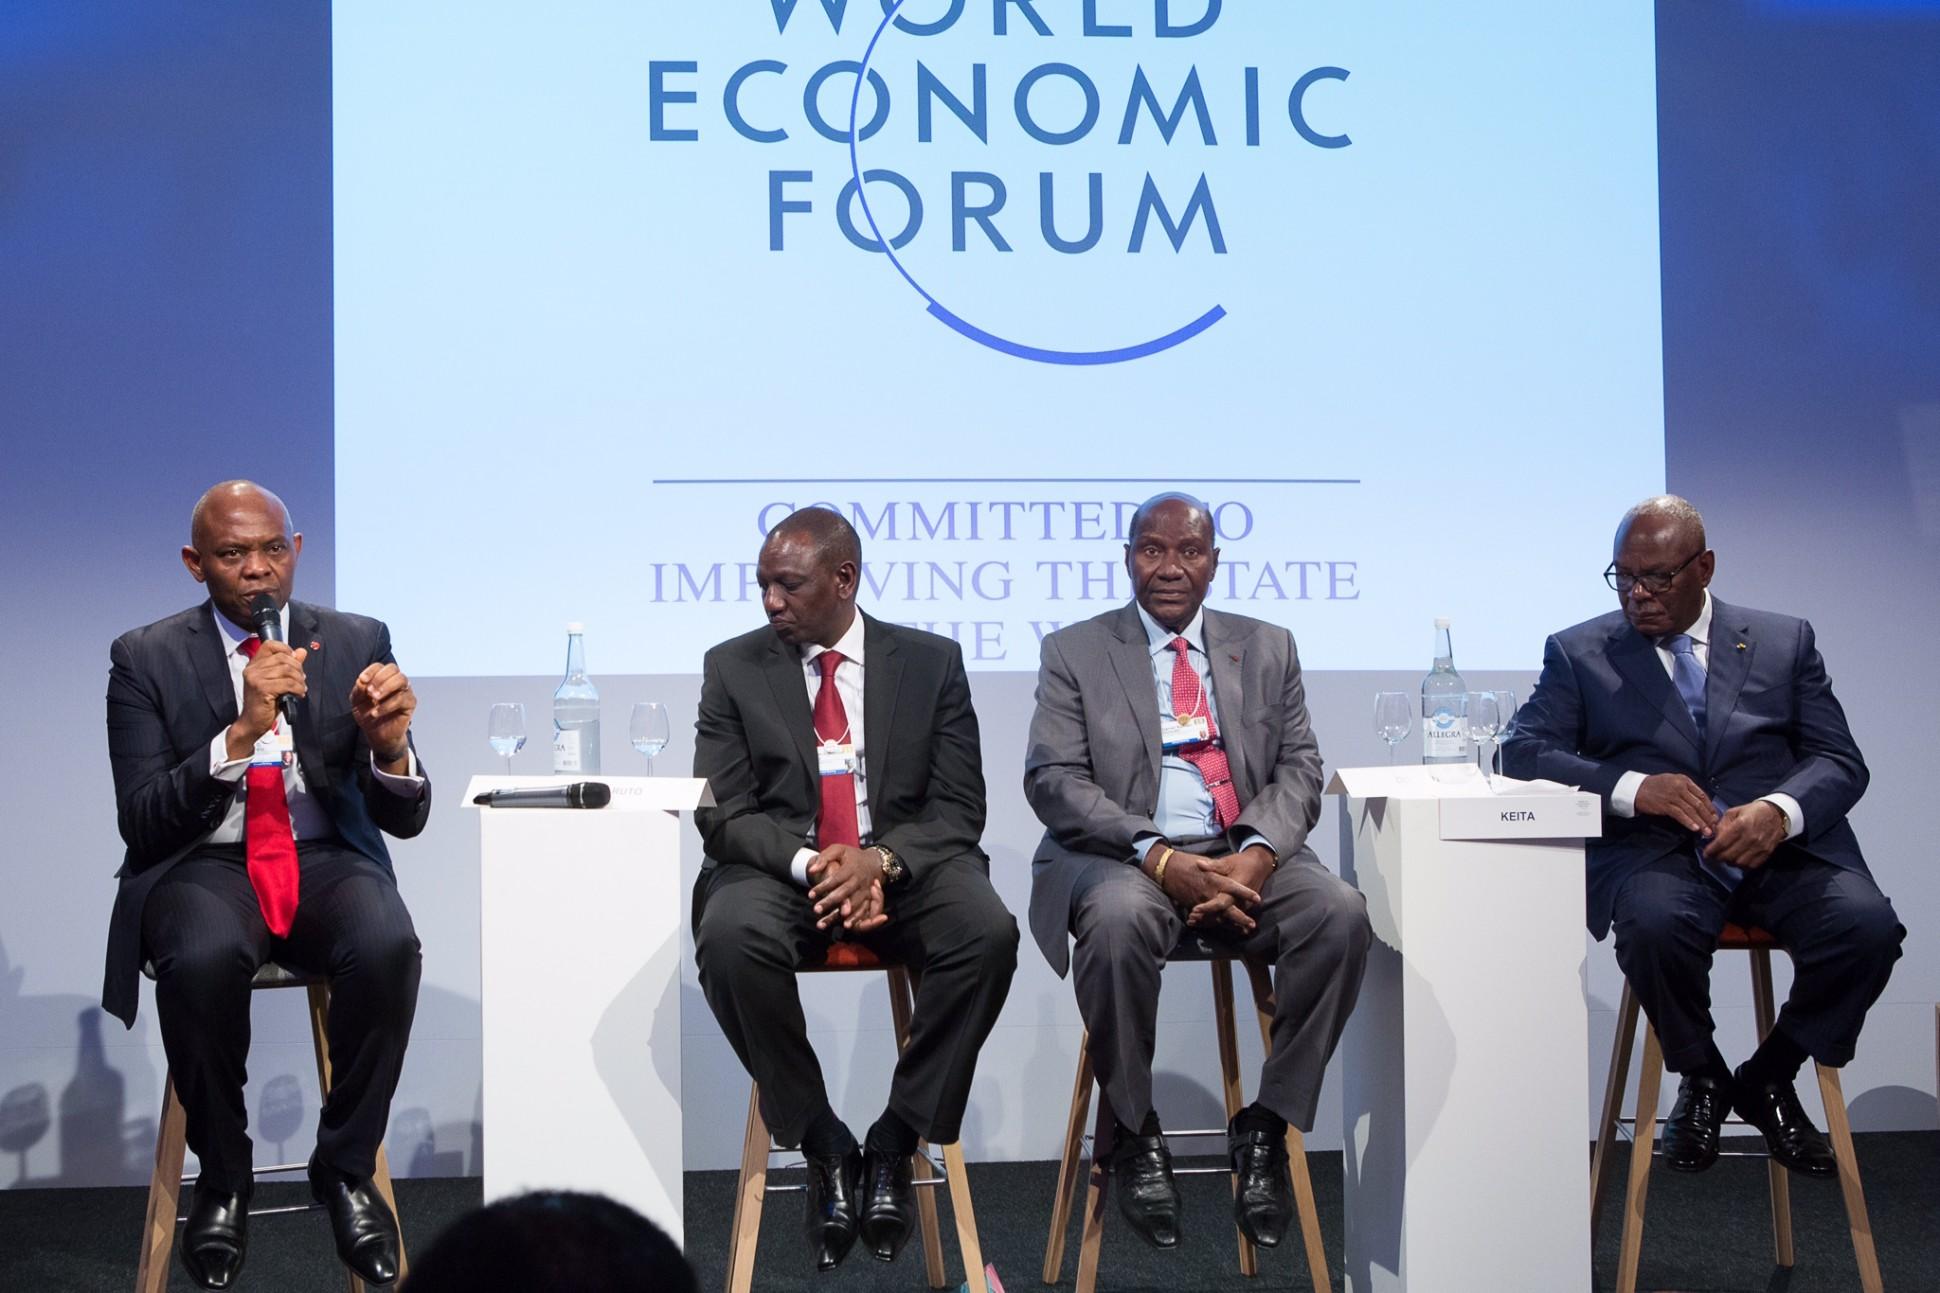 Mr. Tony O. Elumelu, CON speaking at the 2015 World Economic Forum, in Davos, Switzerland